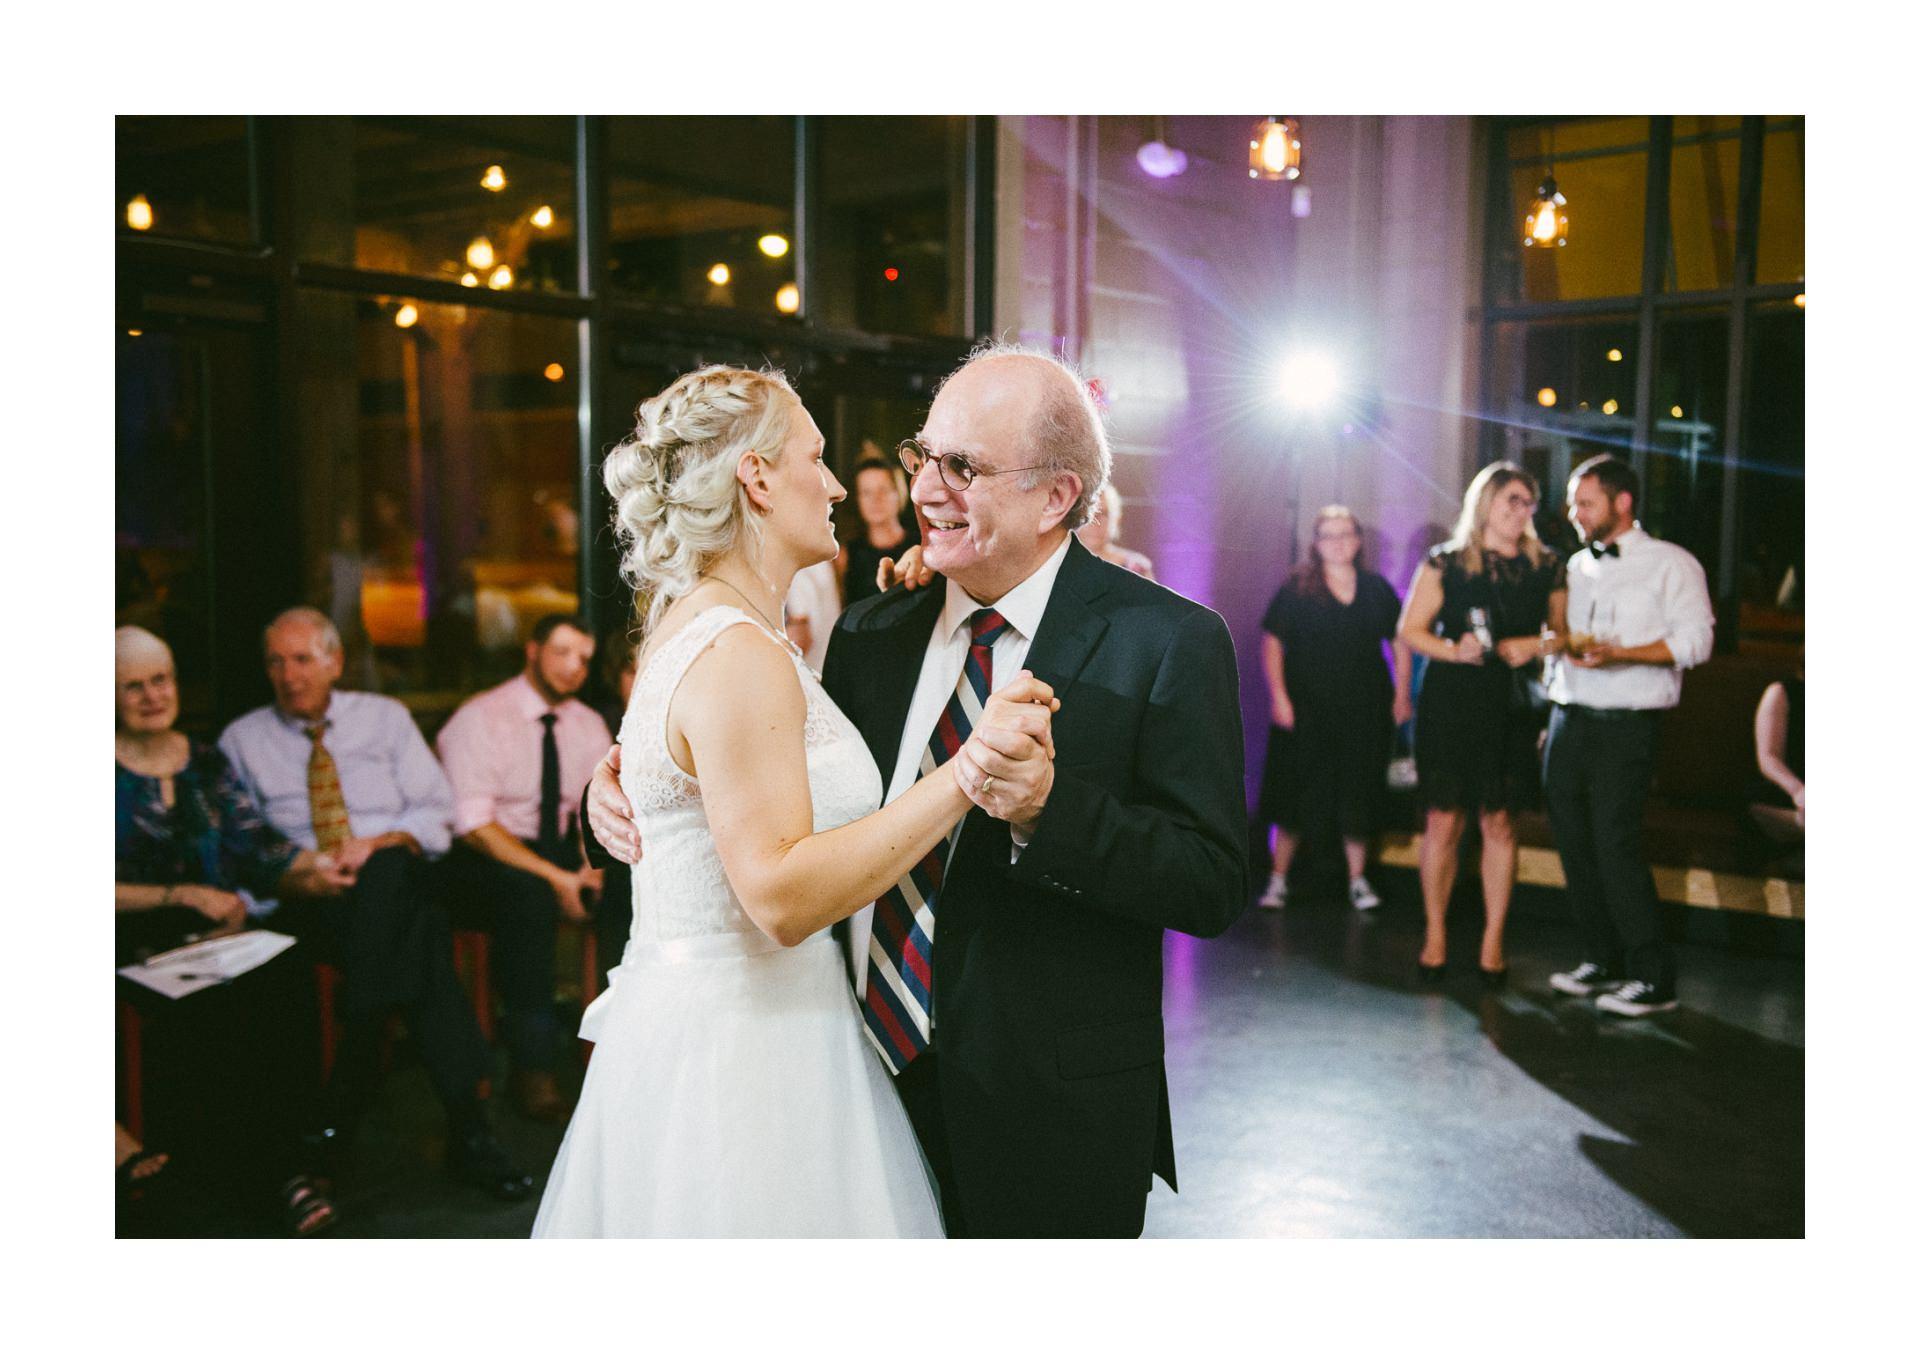 Goldhorn Brewery Wedding Photos in Cleveland 2 41.jpg